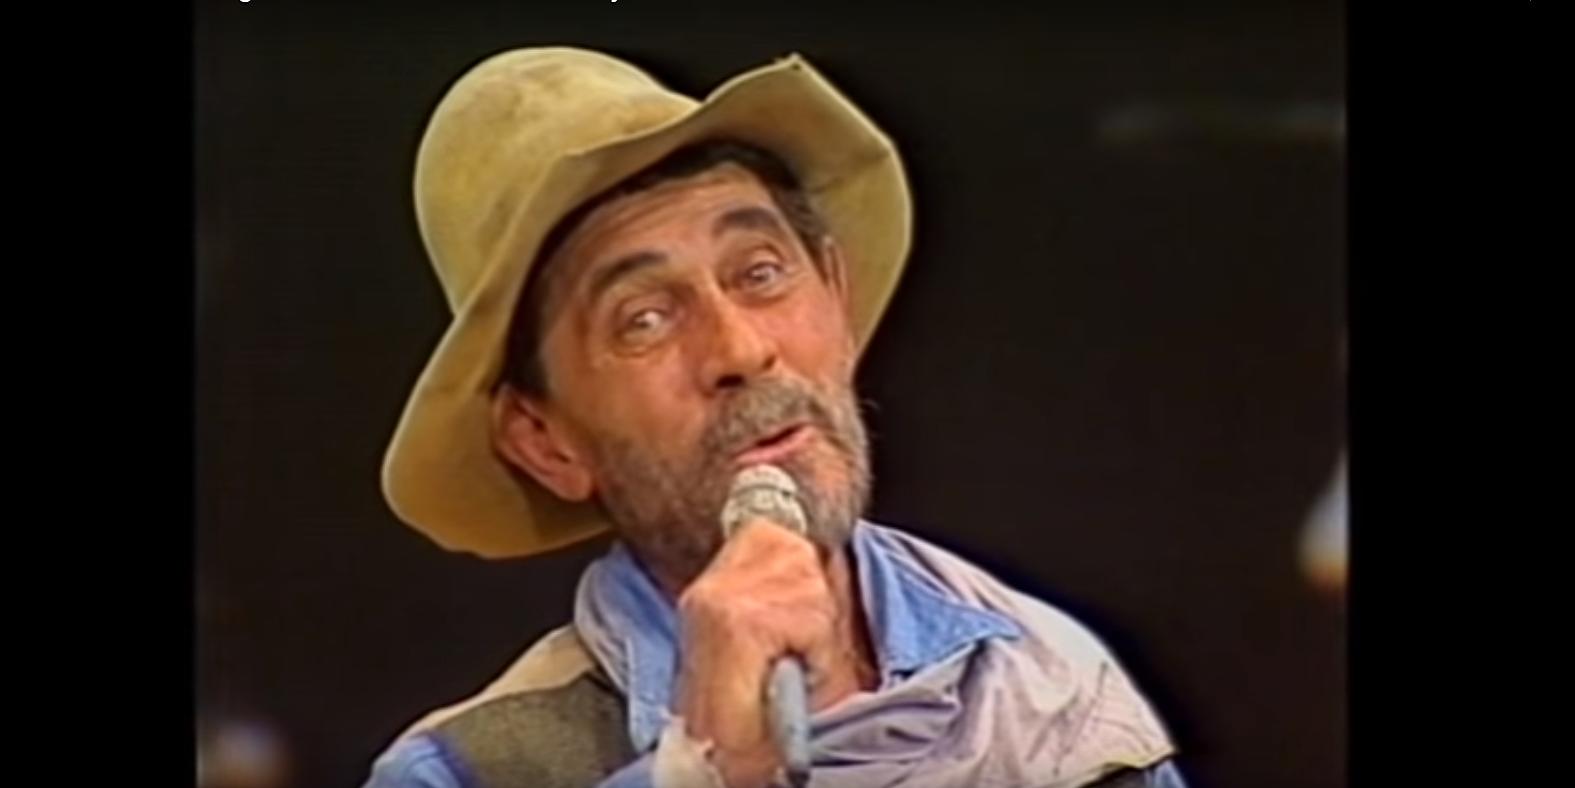 Gunsmokes' Deputy Festus Haggen Colorado's Most Famous Cowboy